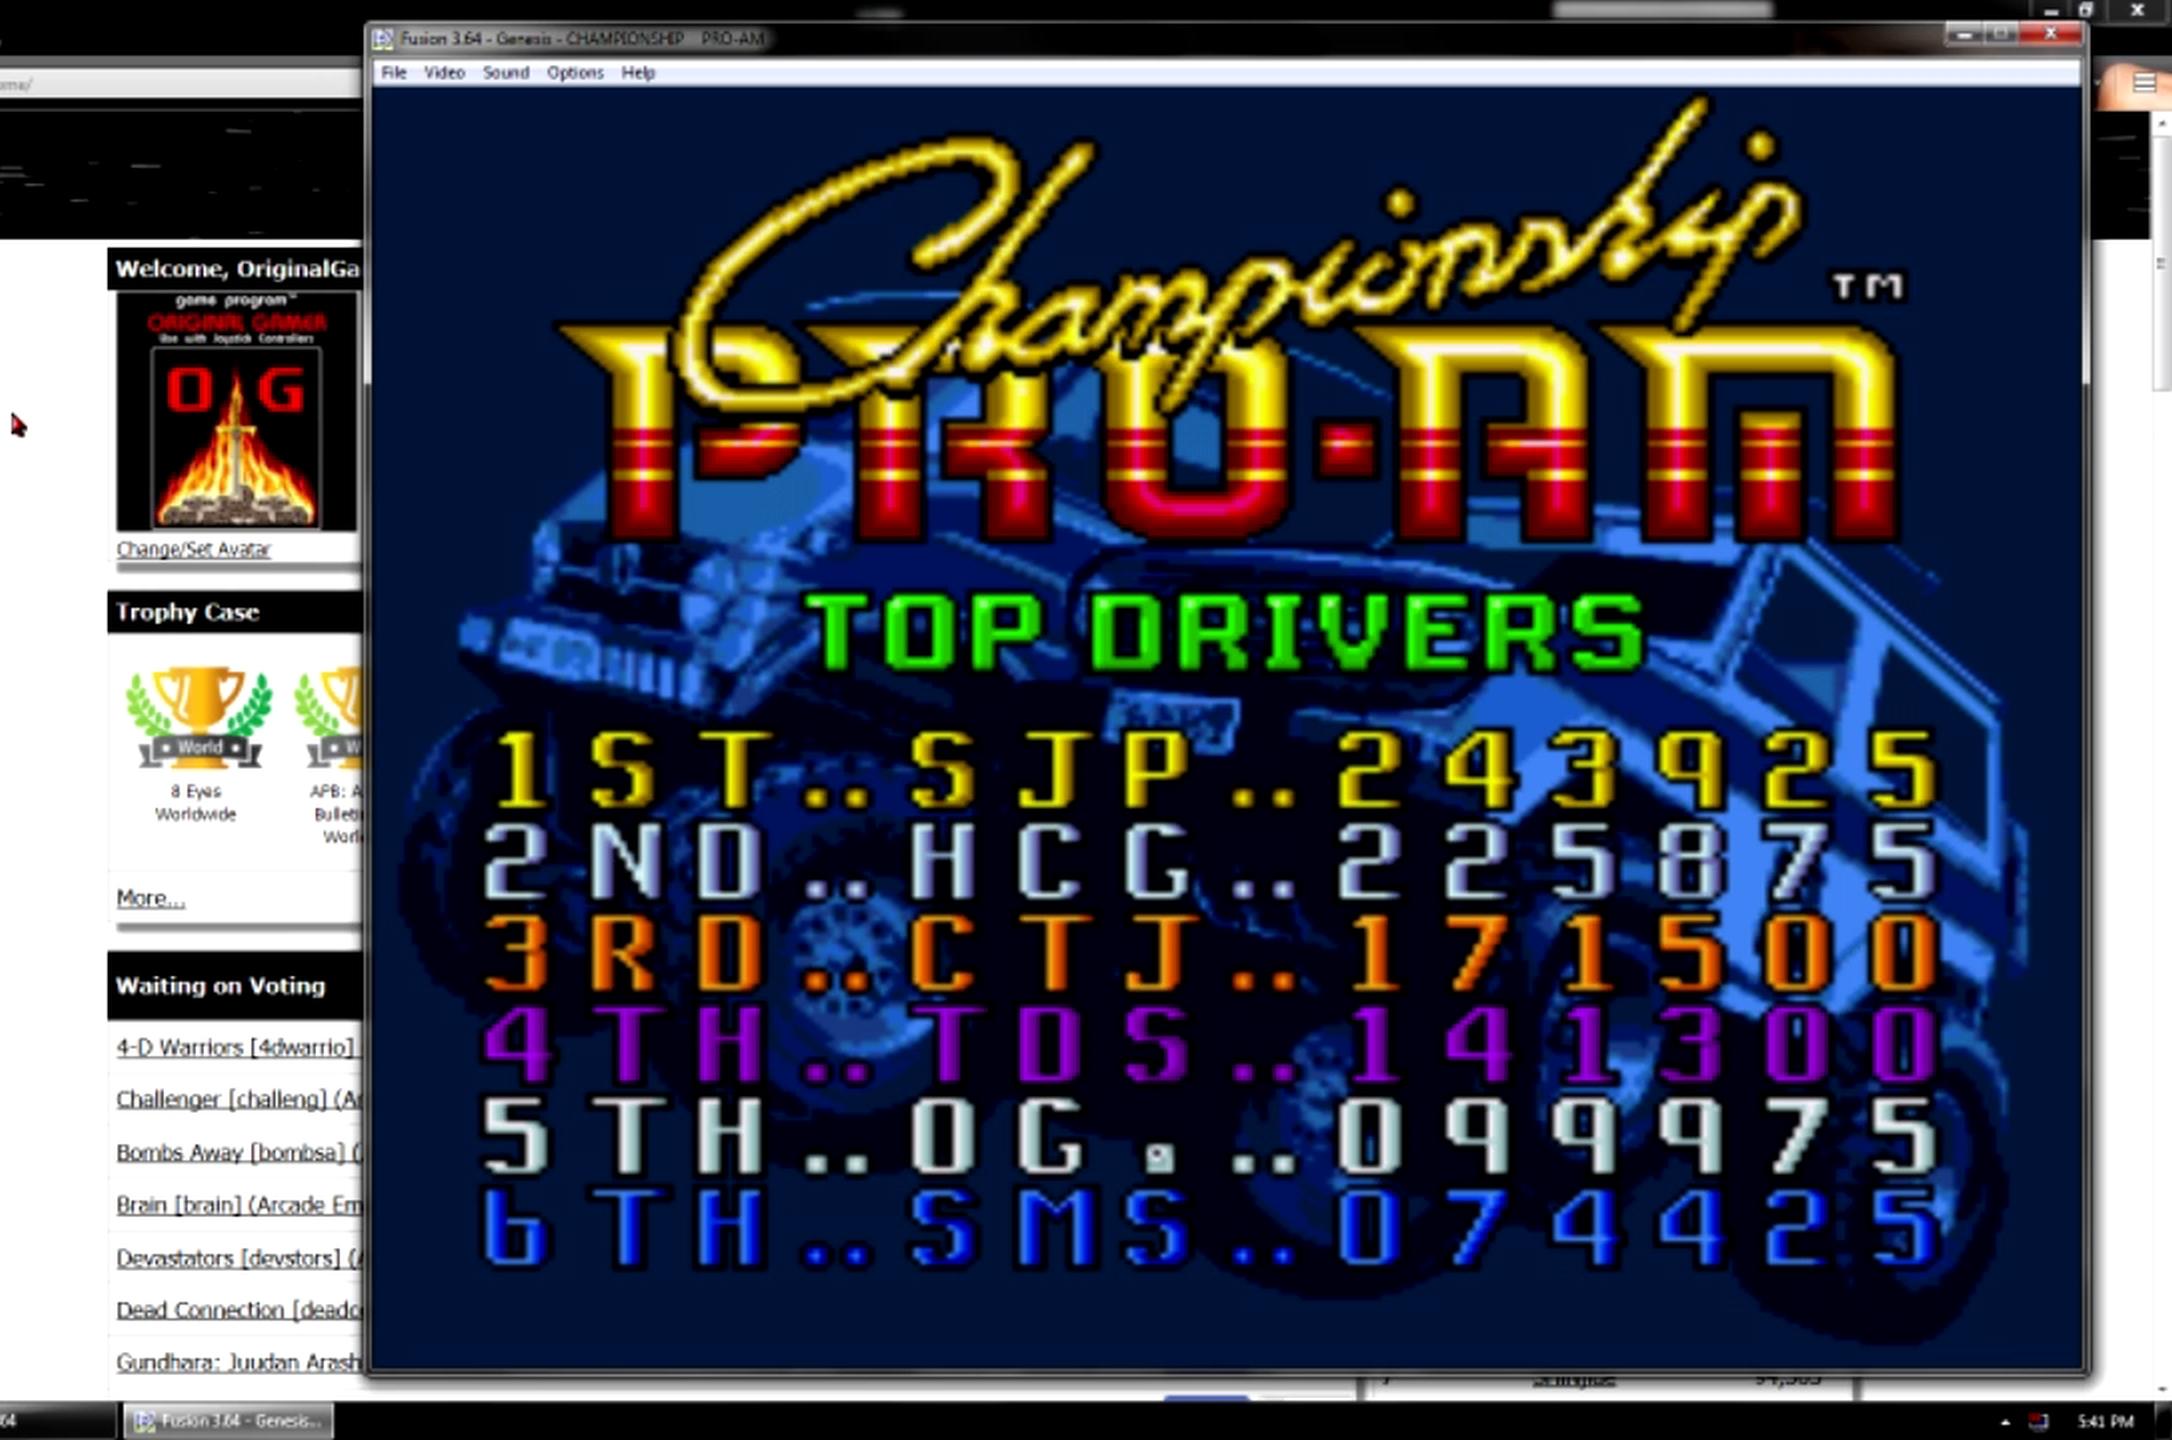 OriginalGamer: Championship Pro-Am (Sega Genesis / MegaDrive Emulated) 99,975 points on 2015-06-22 22:56:51